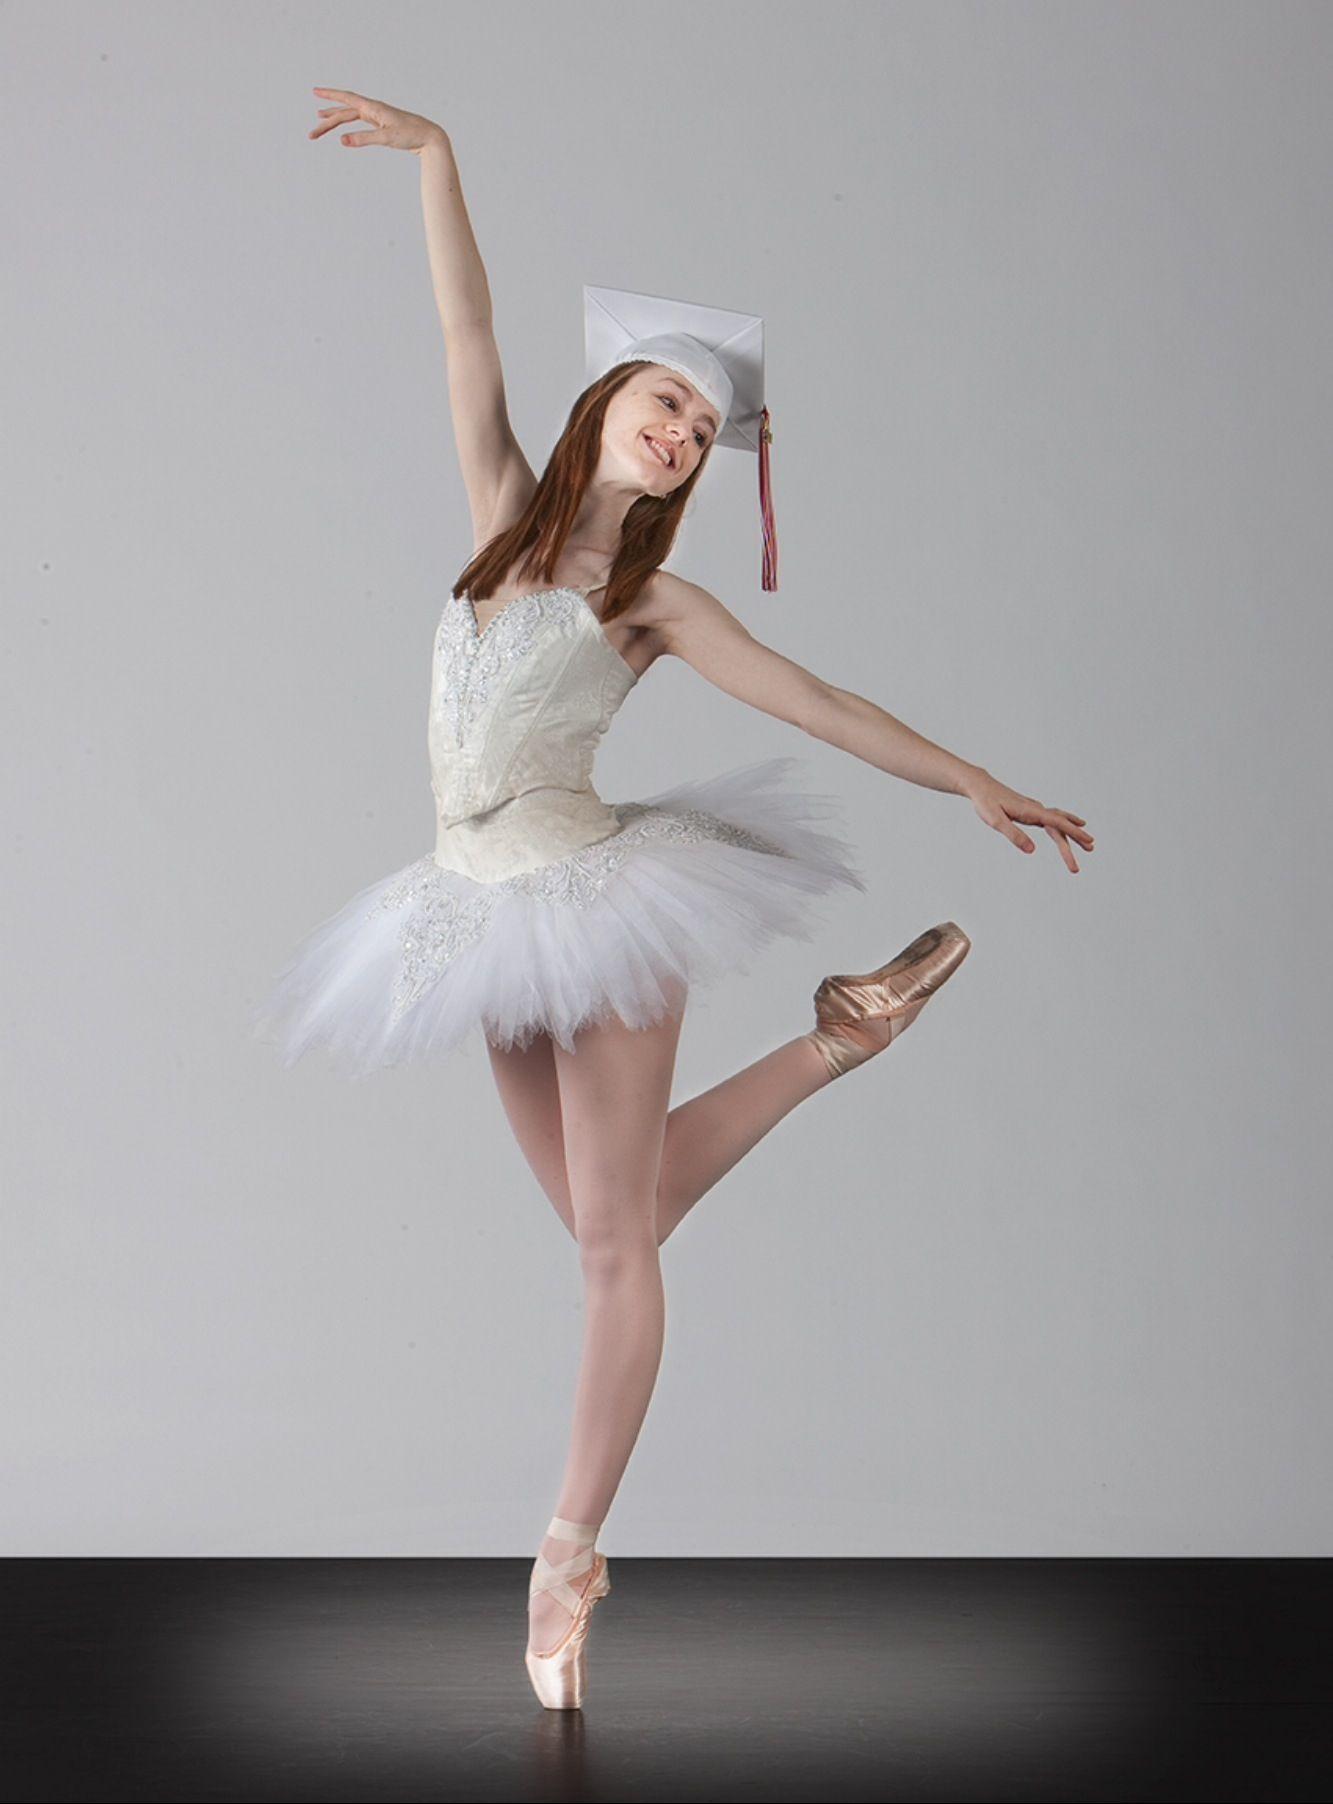 тот поза балерина фото попрощался сестрой взяв